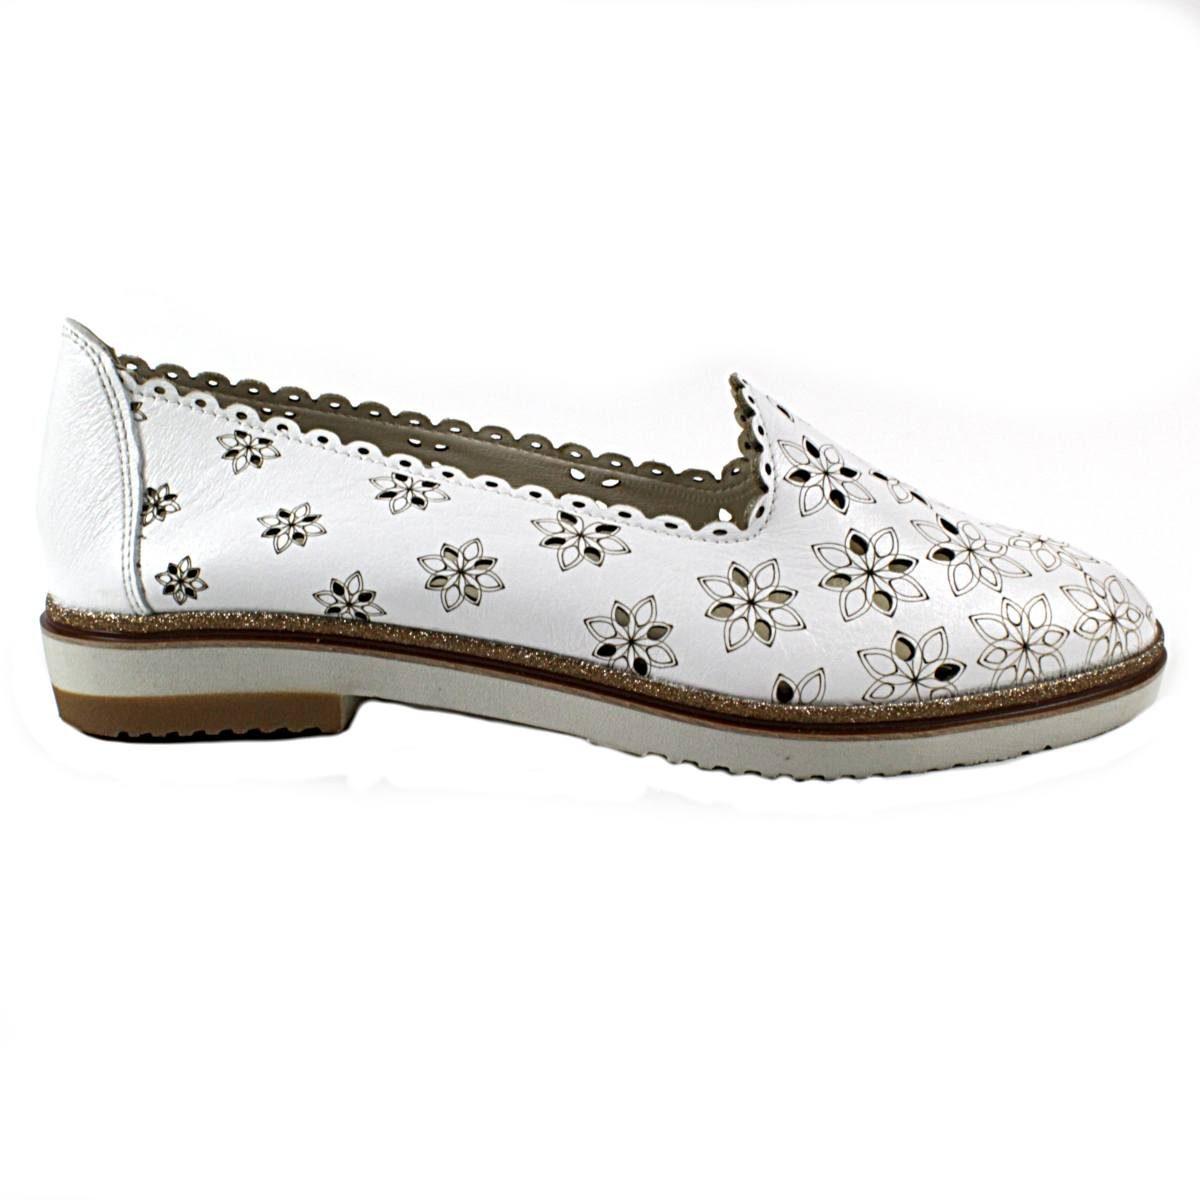 Бели Летни Дамски Обувки Естествена Кожа на Цветя Една